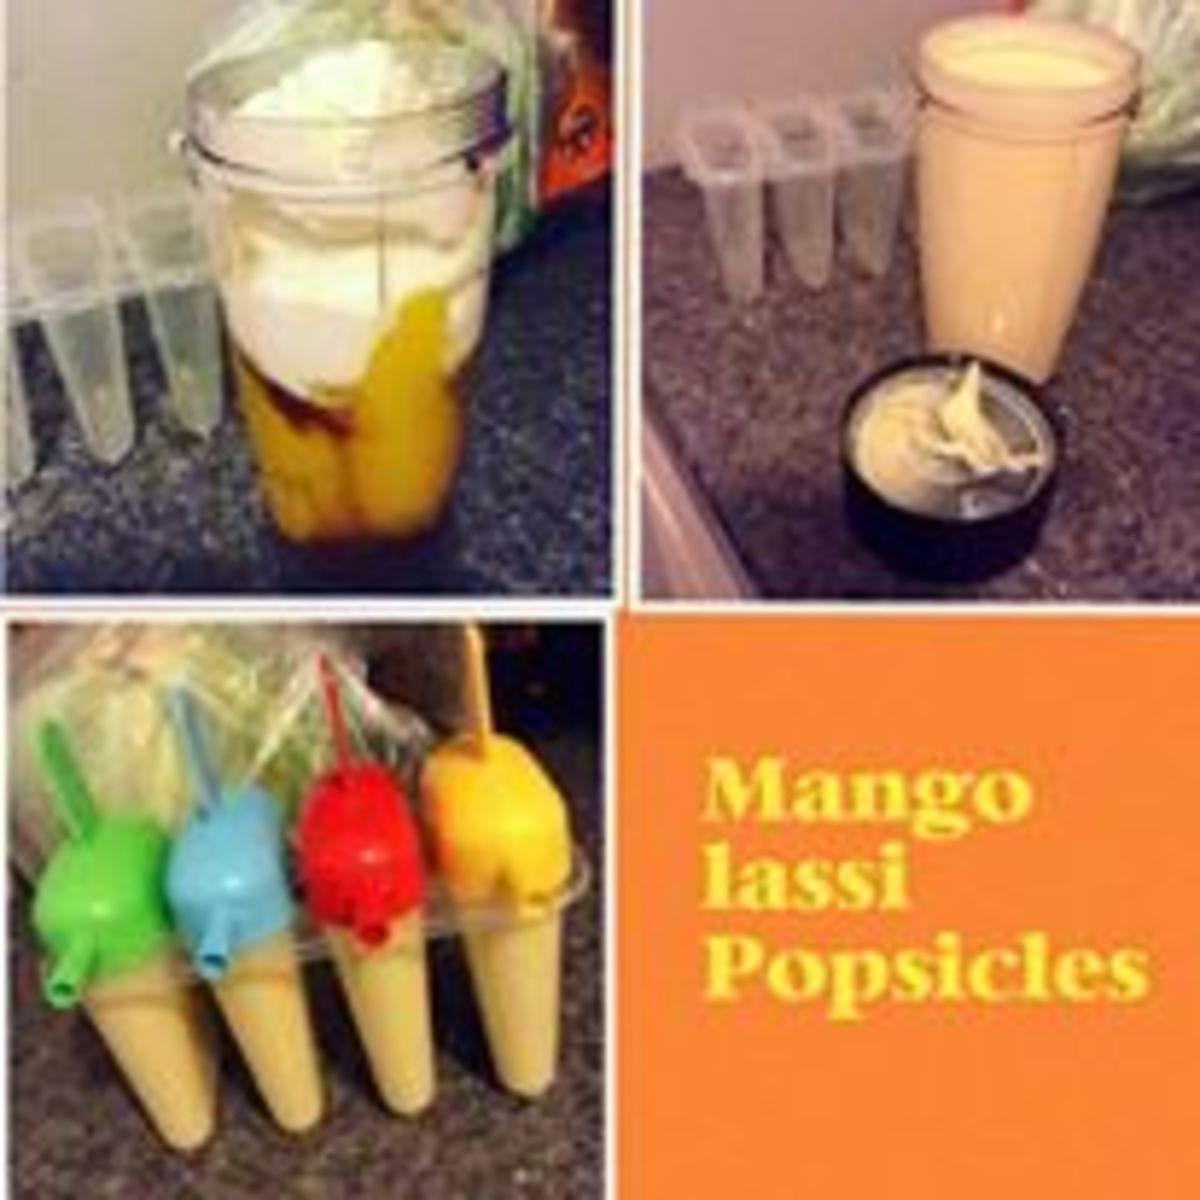 Mango lassi popsicles,made using mangoes, cardamom, vanilla, yogurt, and chia seeds.